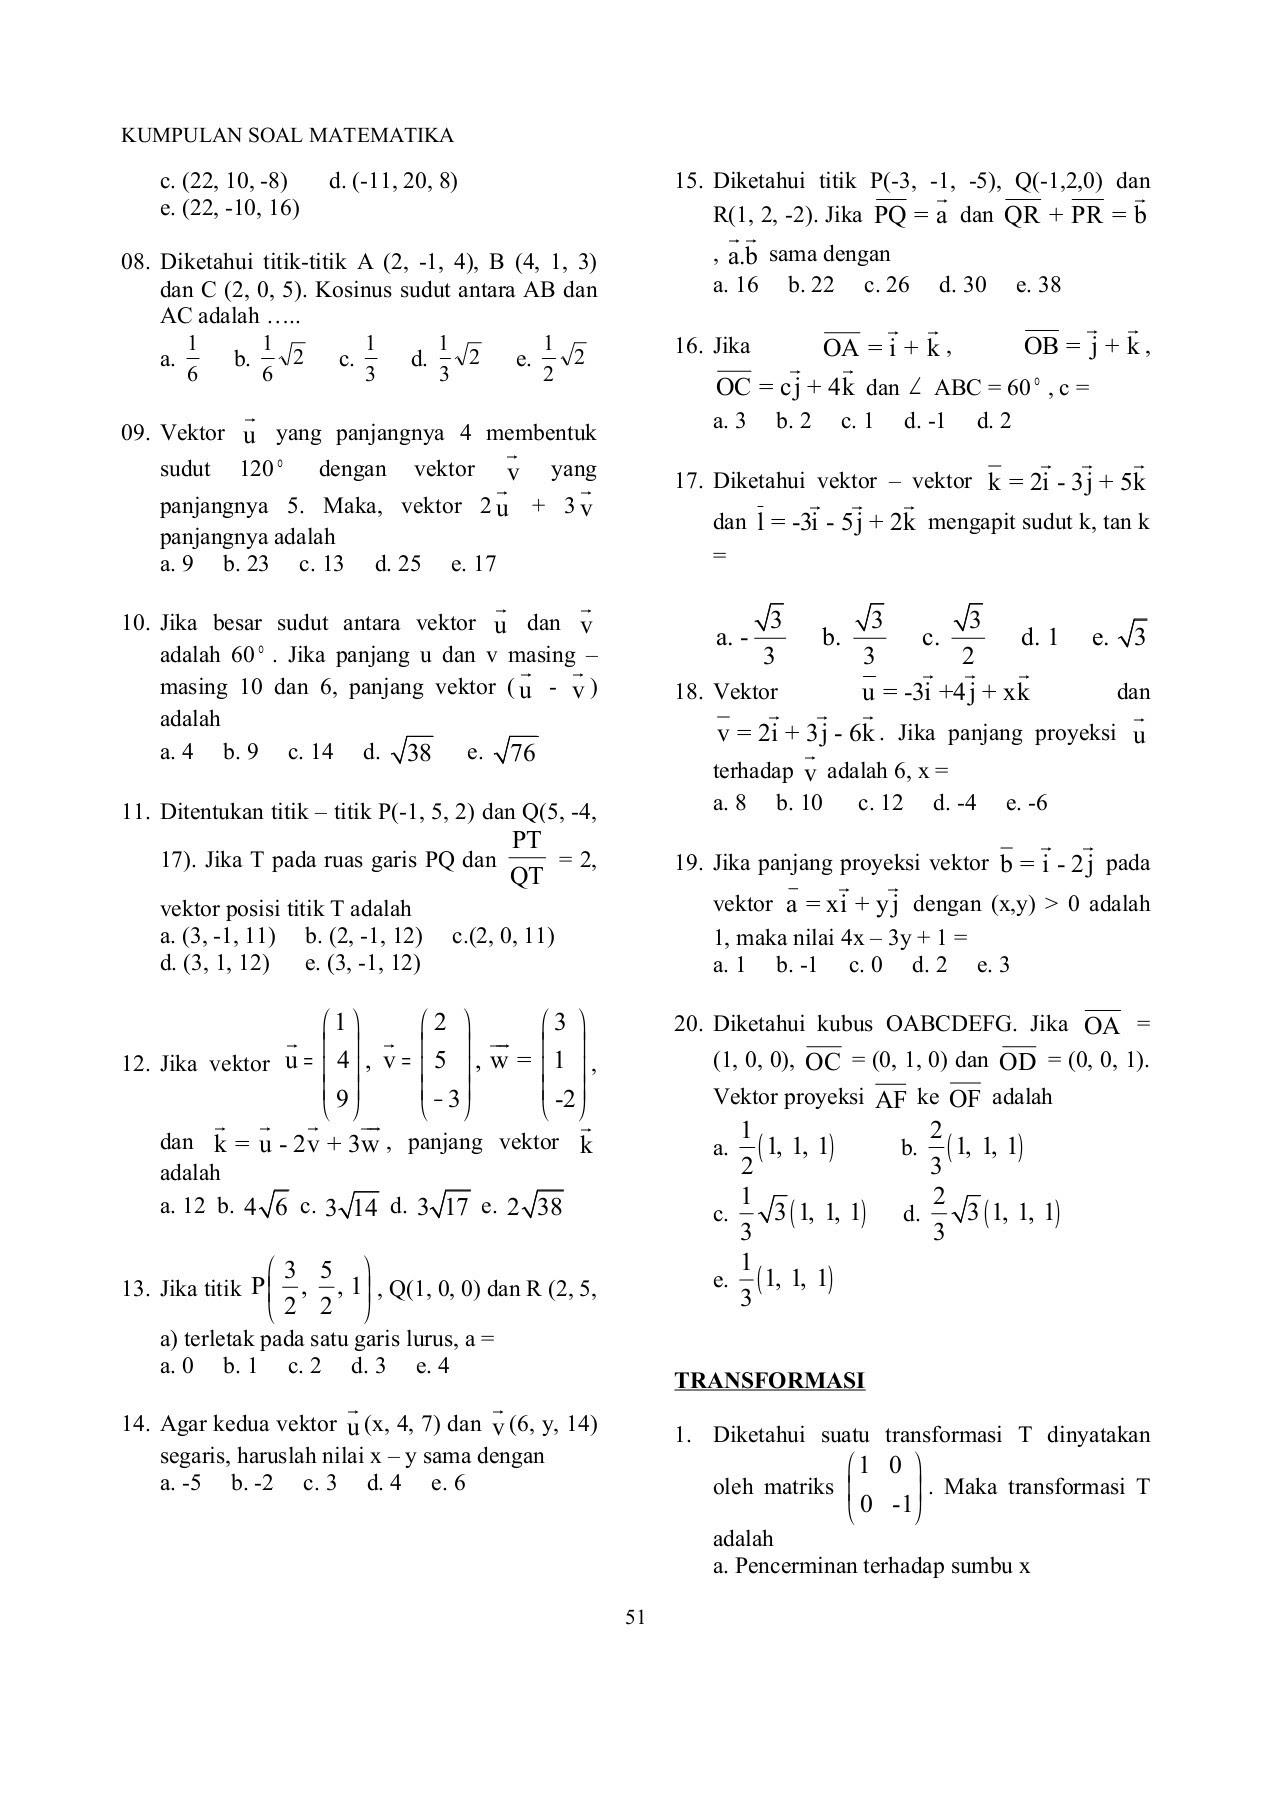 Vektor Matematika Peminatan : vektor, matematika, peminatan, Contoh, Vektor, Matematika, Penyelesaiannya, Kelas, Materi, Pelajaran